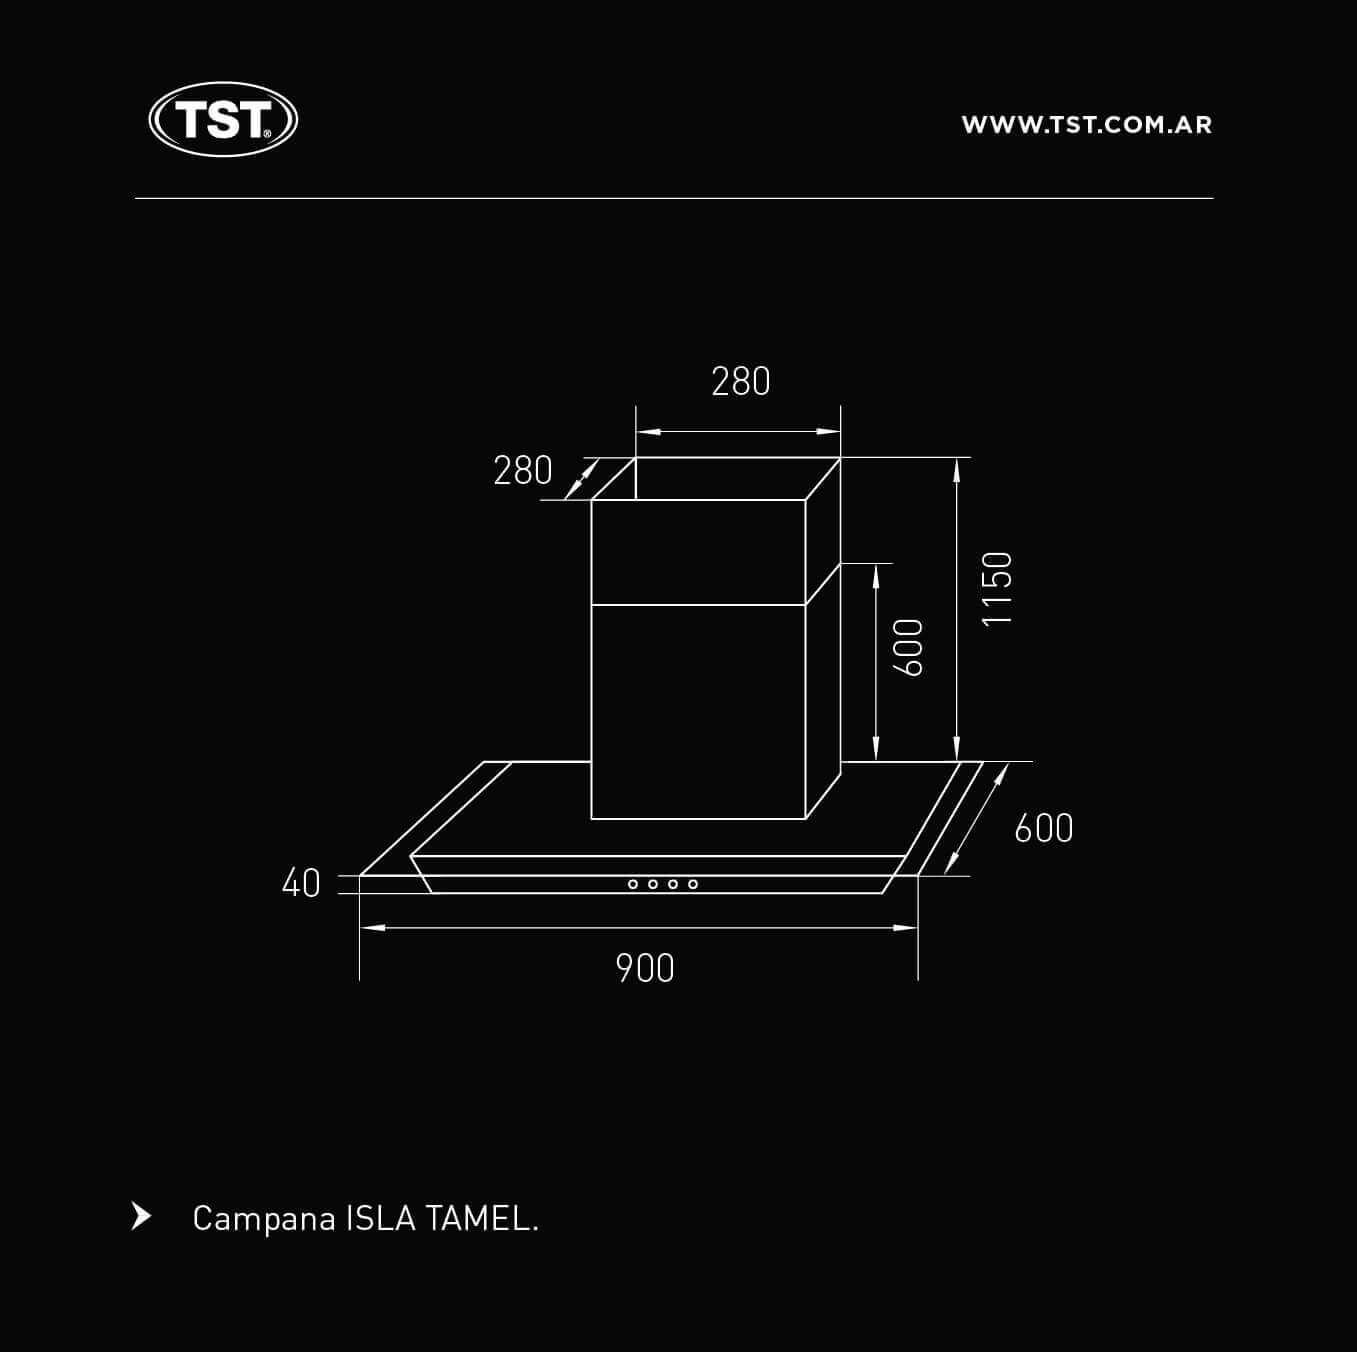 Campana TST Tamel Isla 90 cm